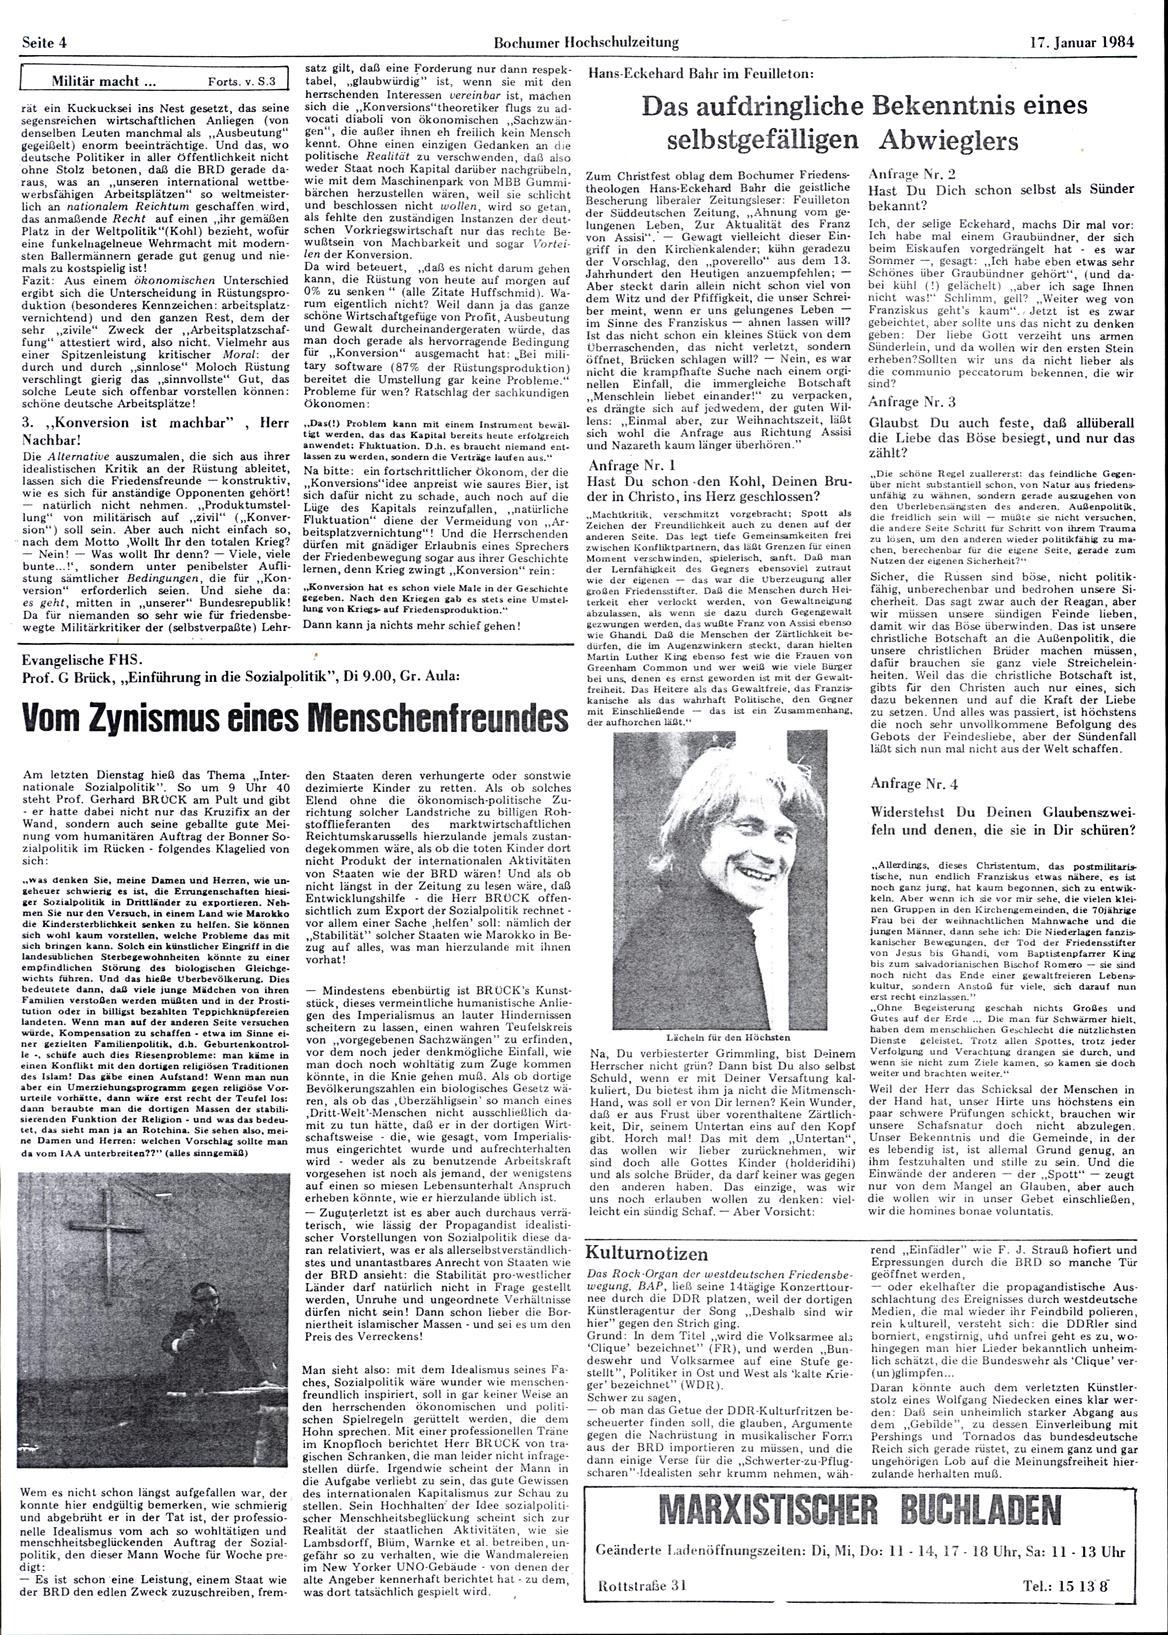 Bochum_BHZ_19840117_085_004